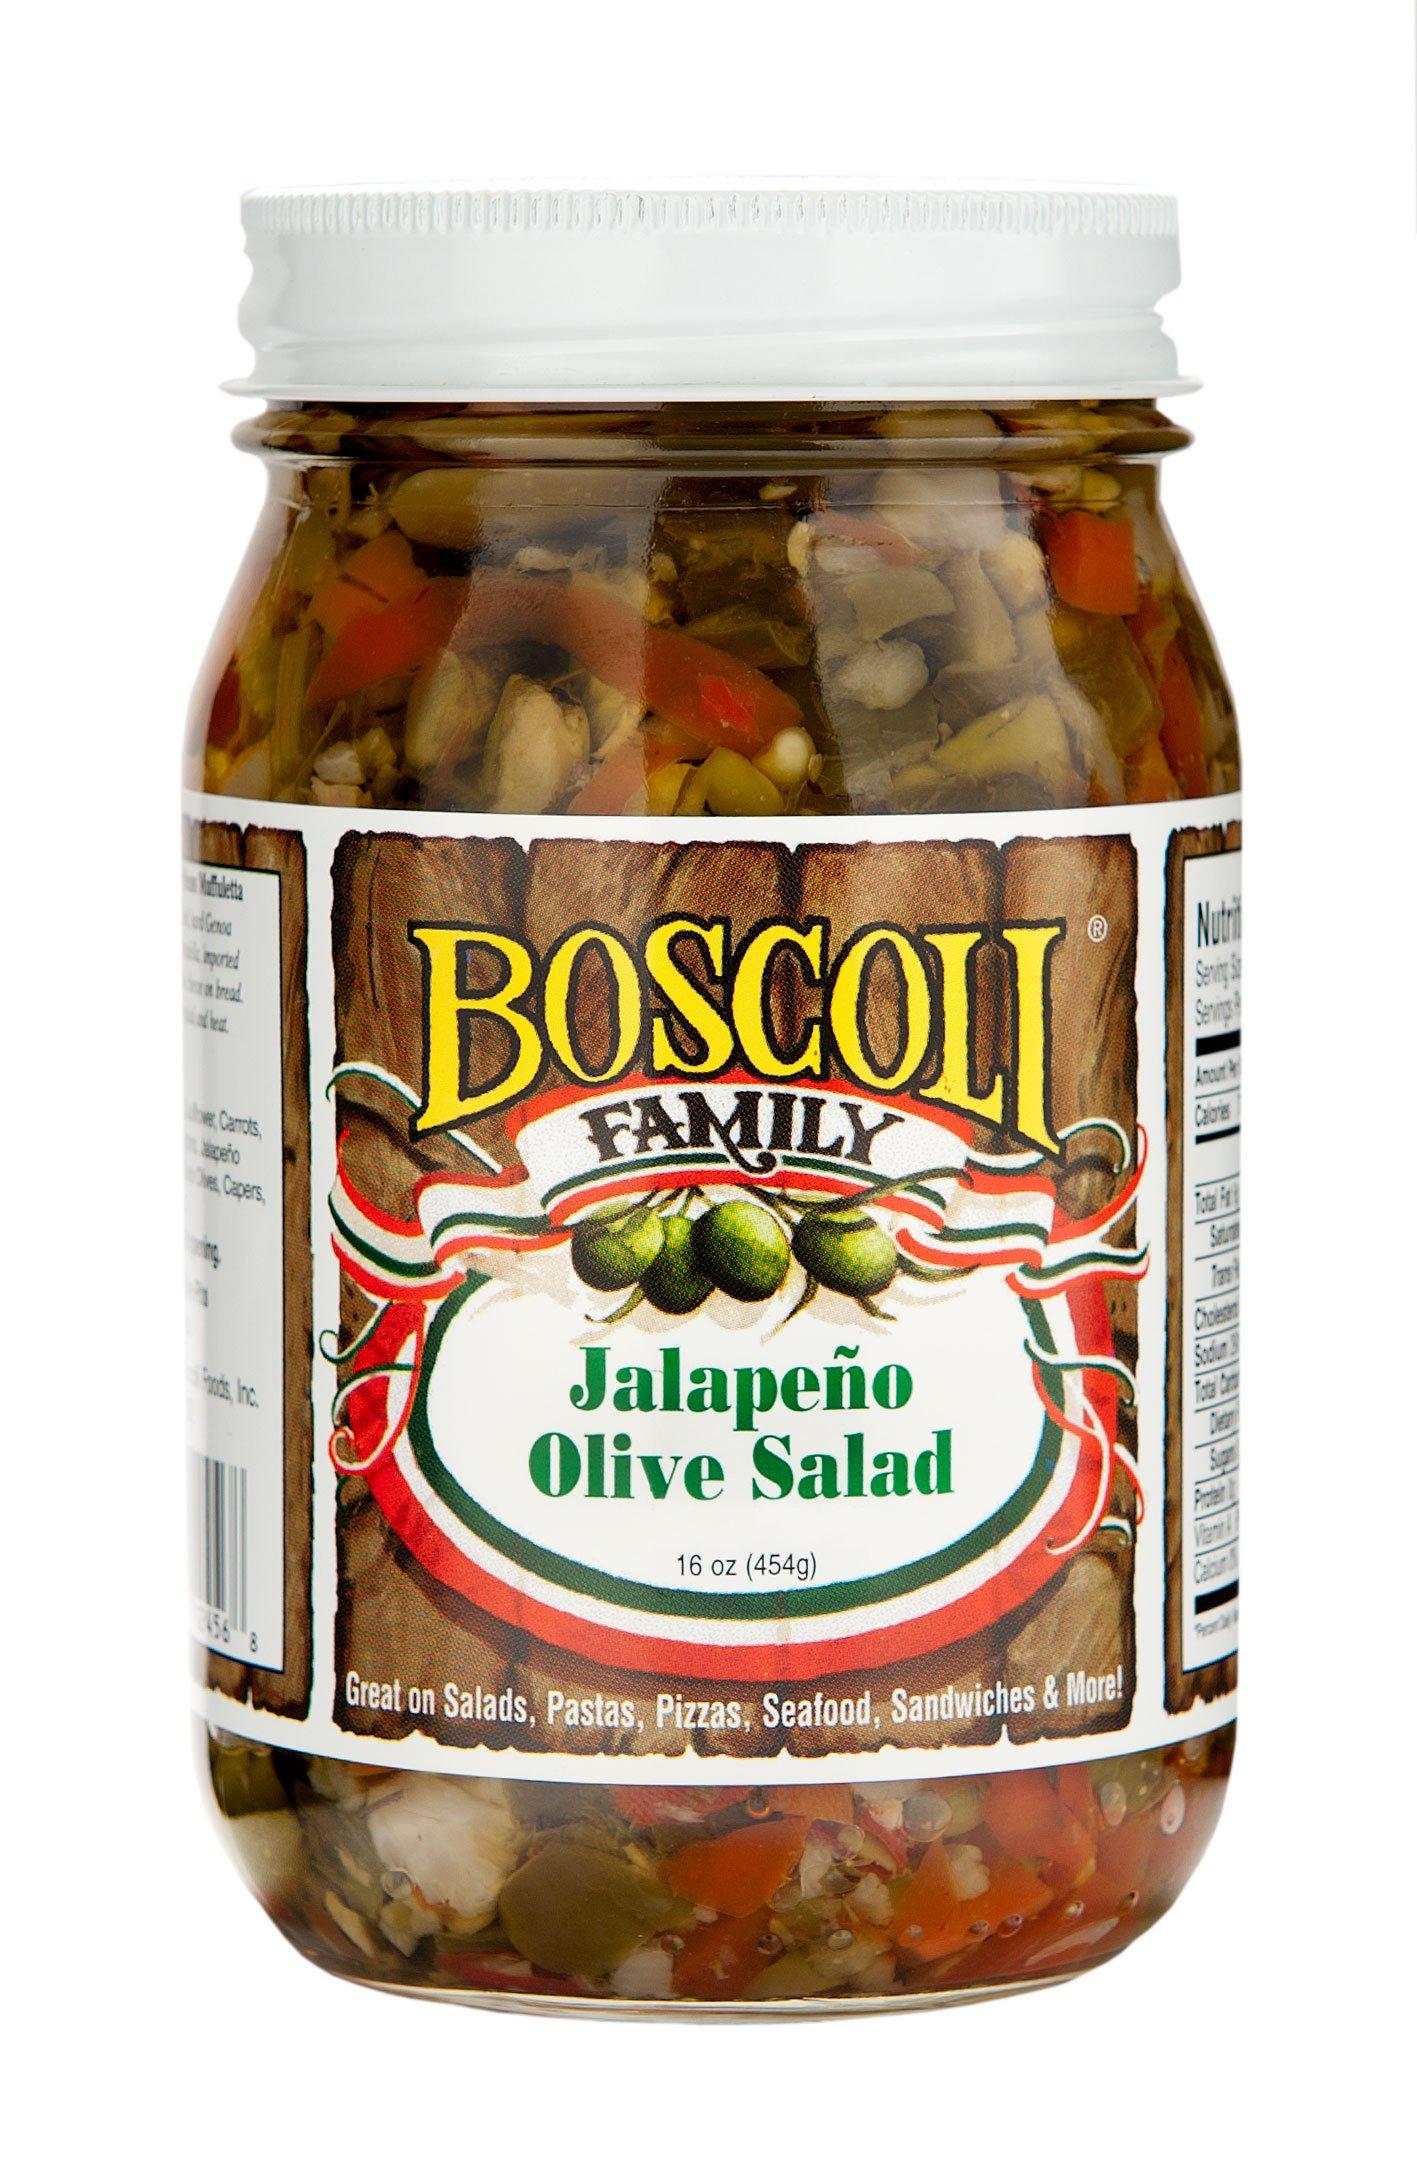 Jalapeno Olive Salad (32oz.)